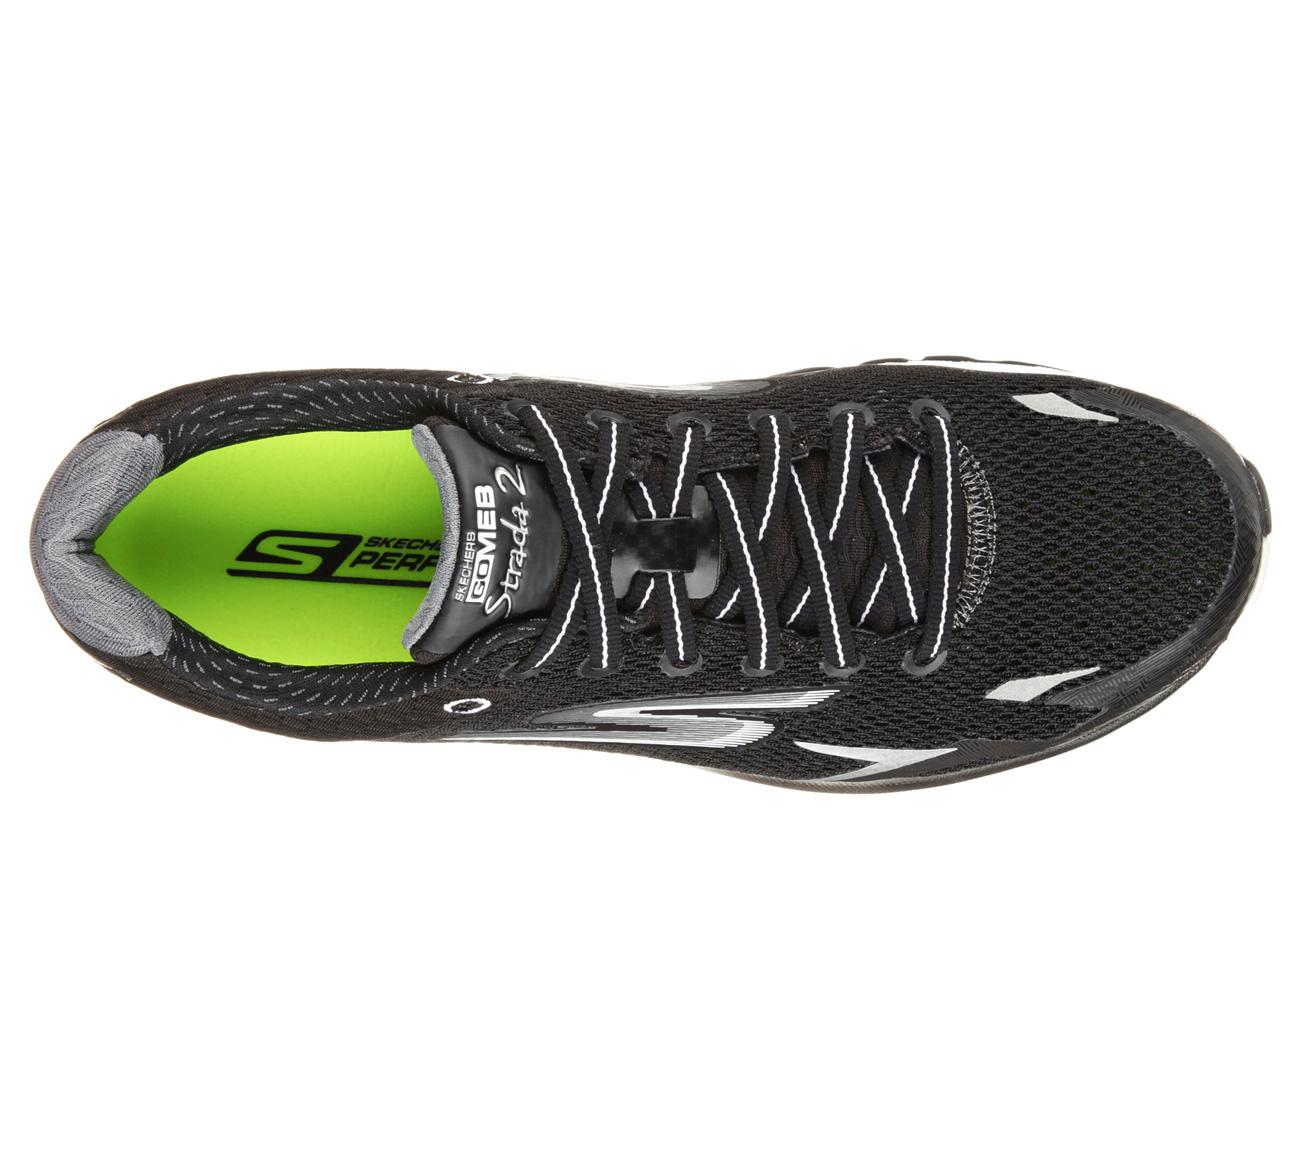 Skechers Performance GOmeb Strada 2 跑鞋 喵喵折